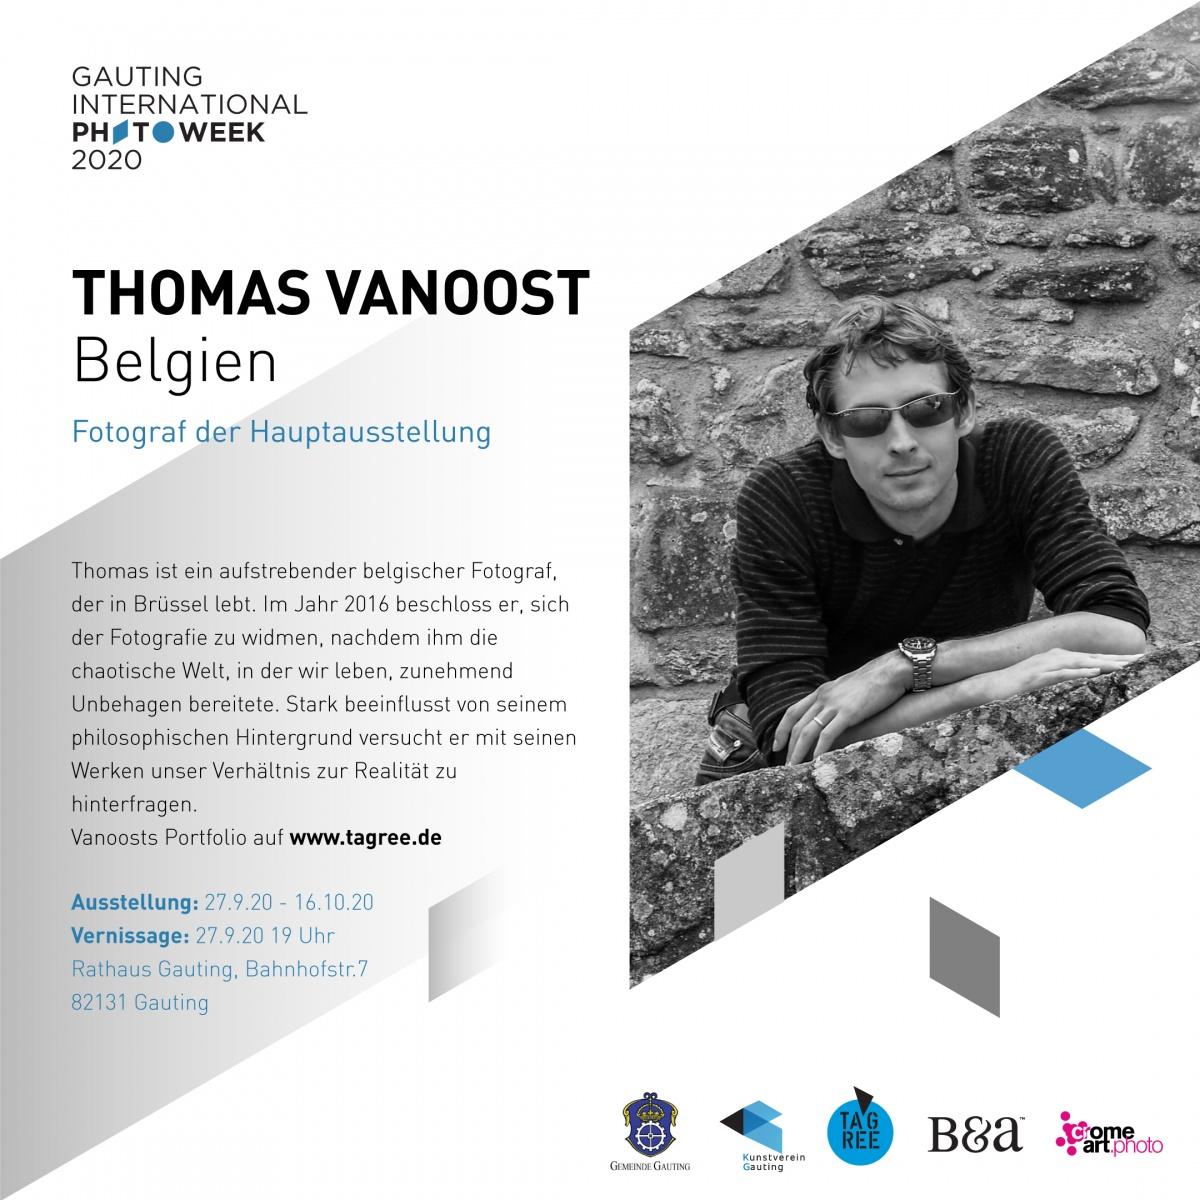 Thomas Vanoost / Belgium